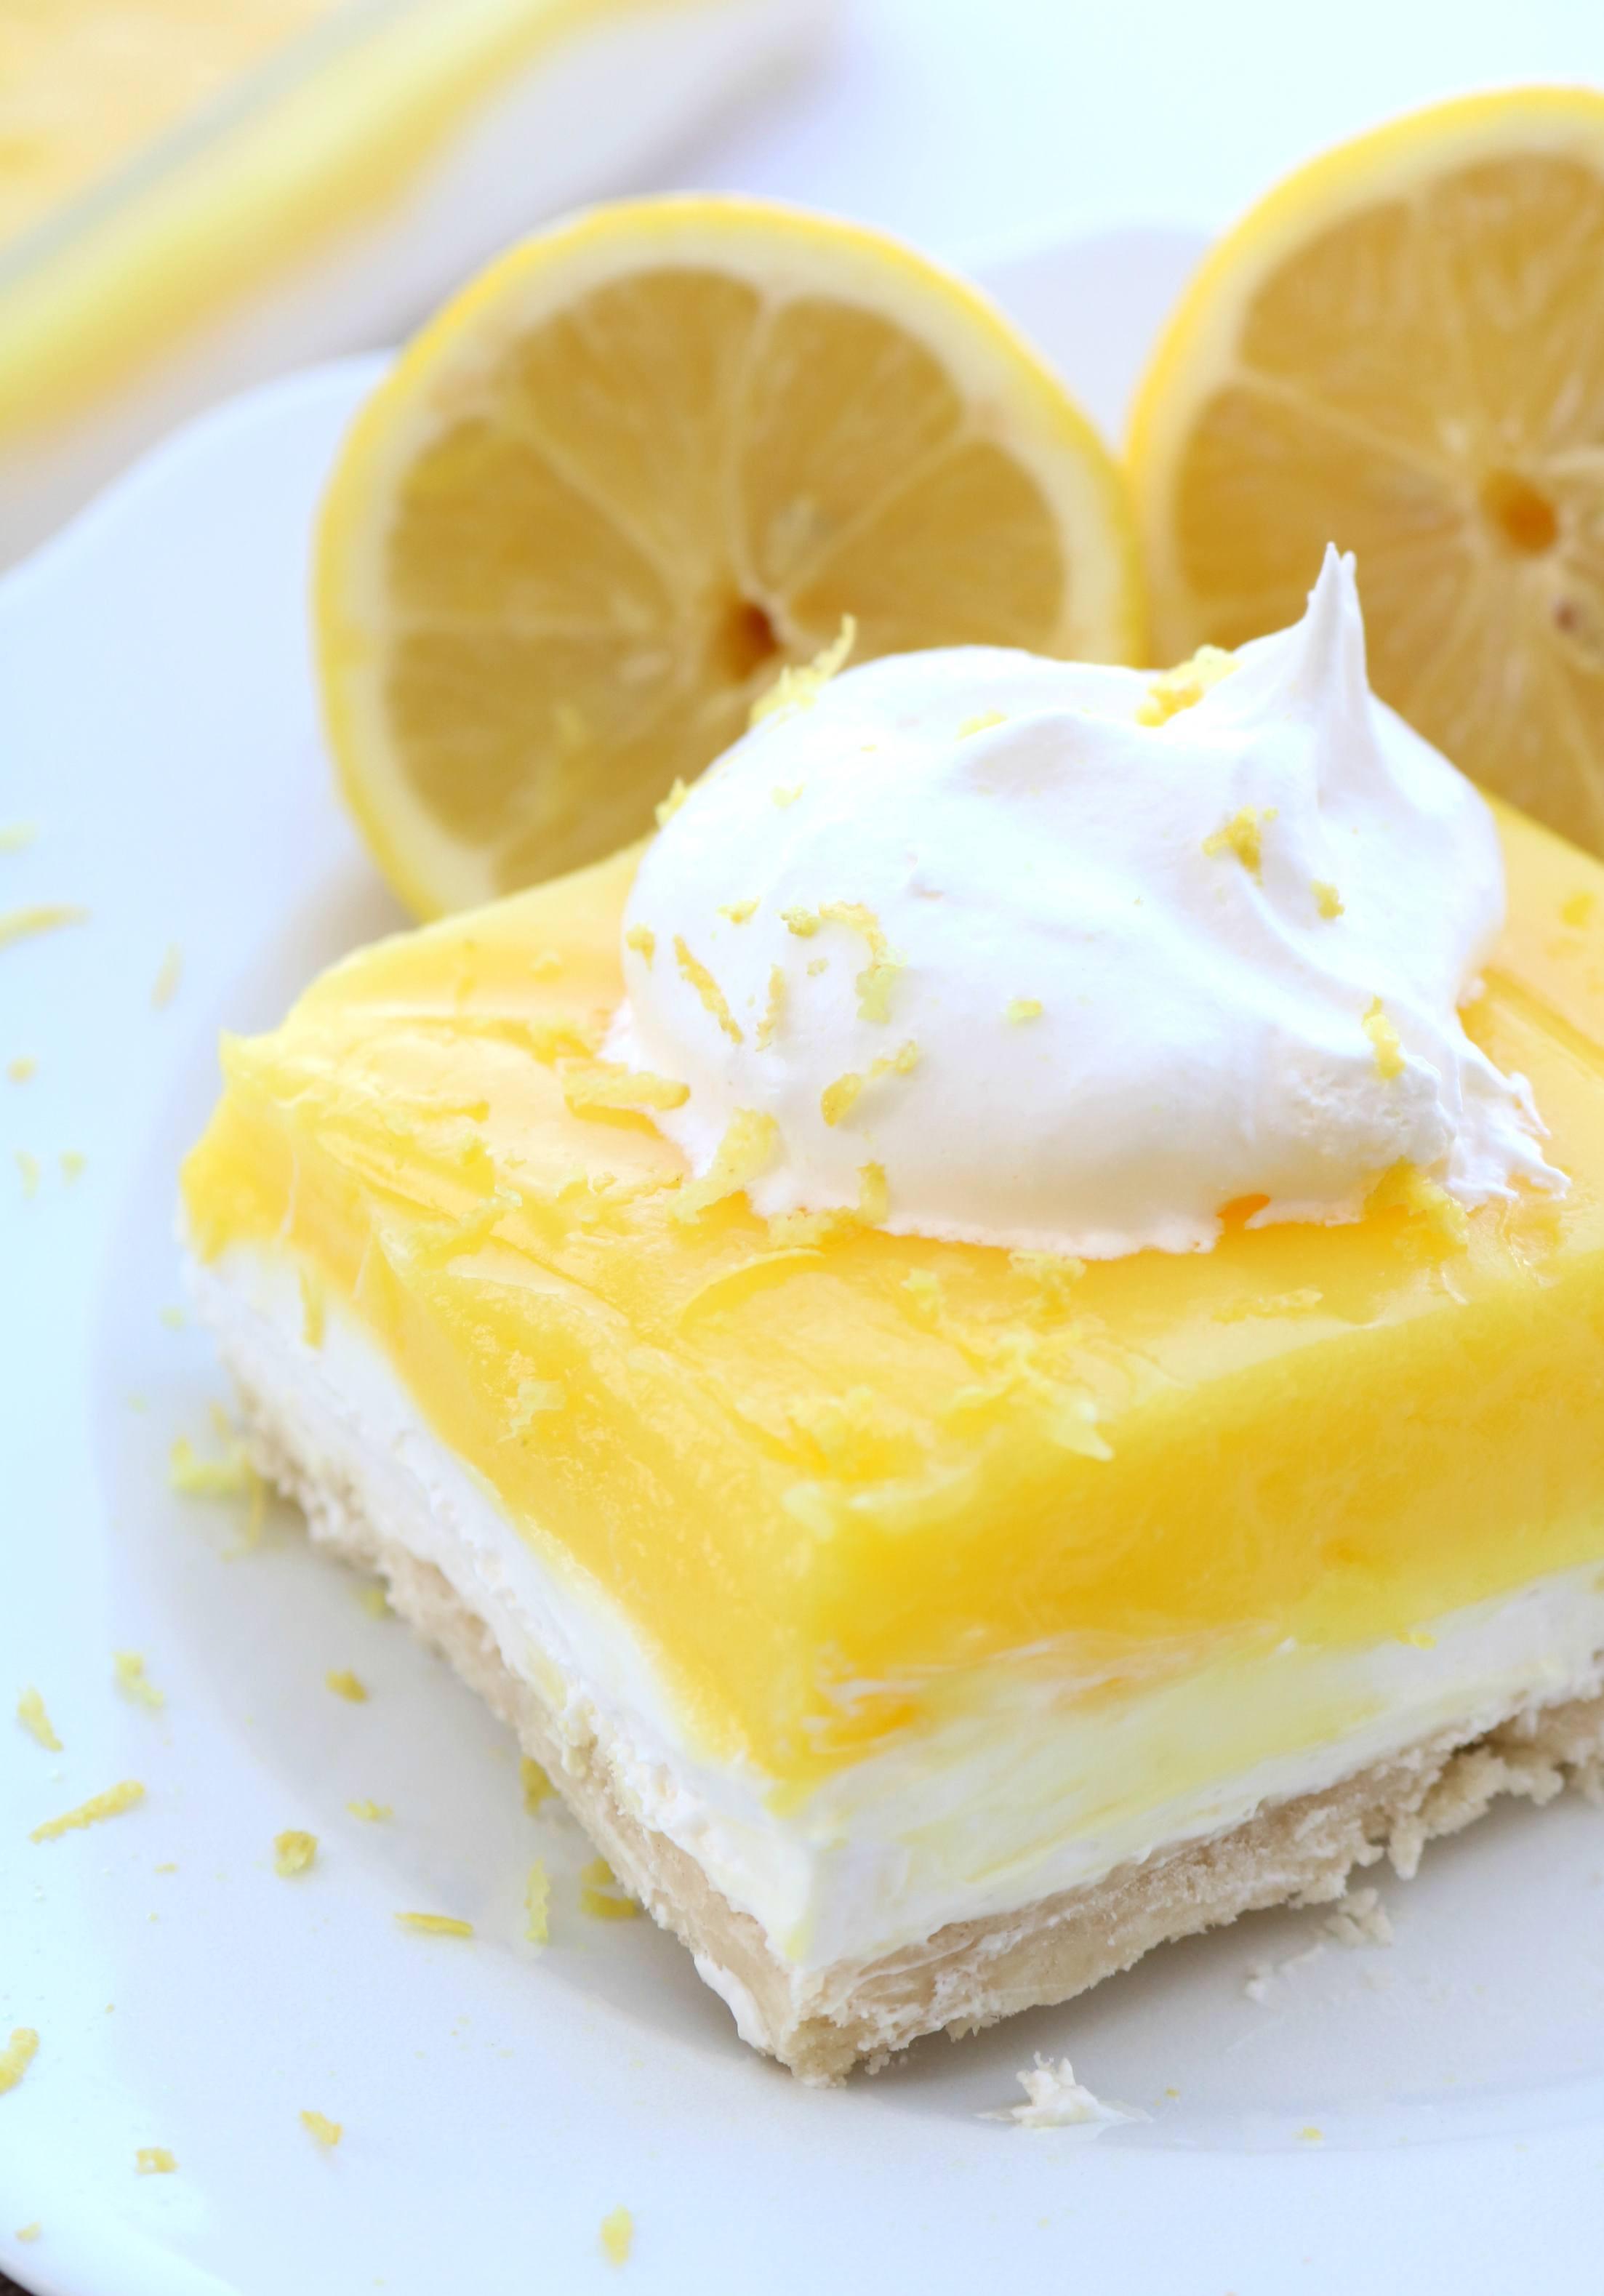 Lemon Pudding Desserts  Layered Lemon Dessert Sugar n Spice Gals